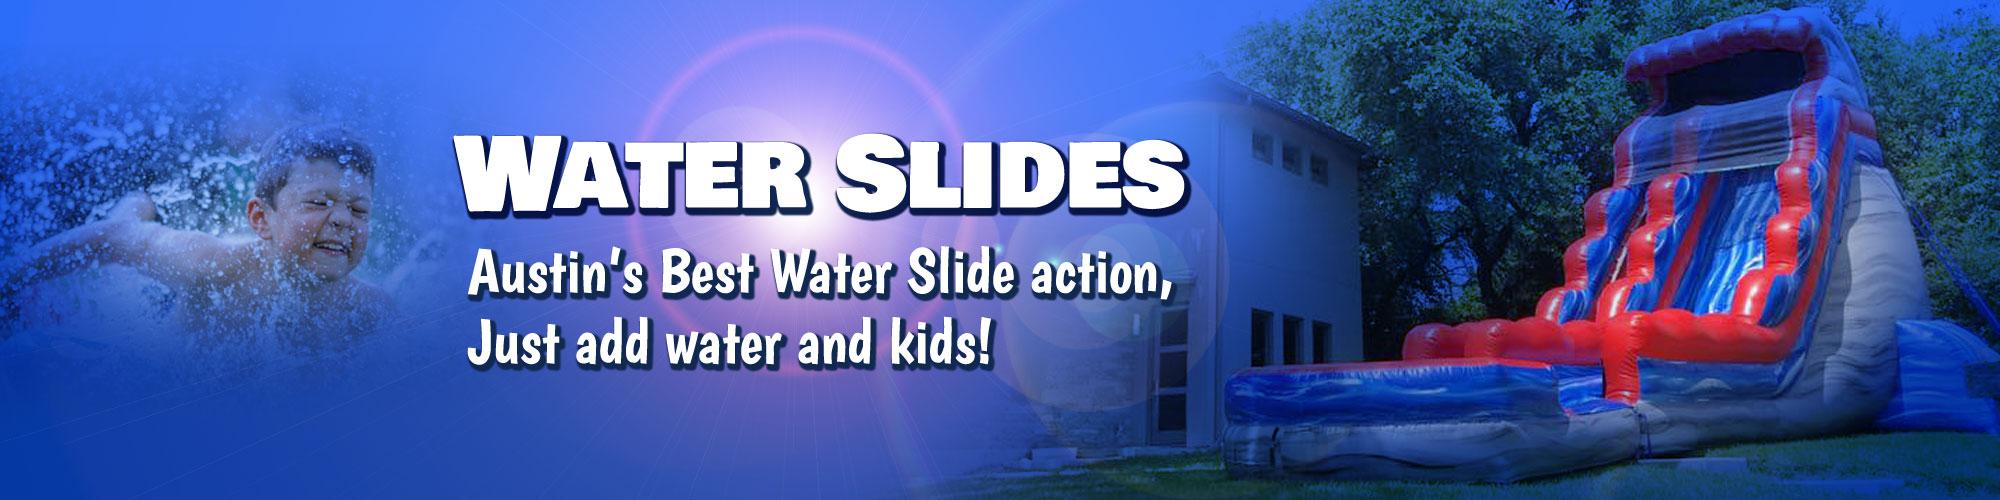 Water Slide Austin